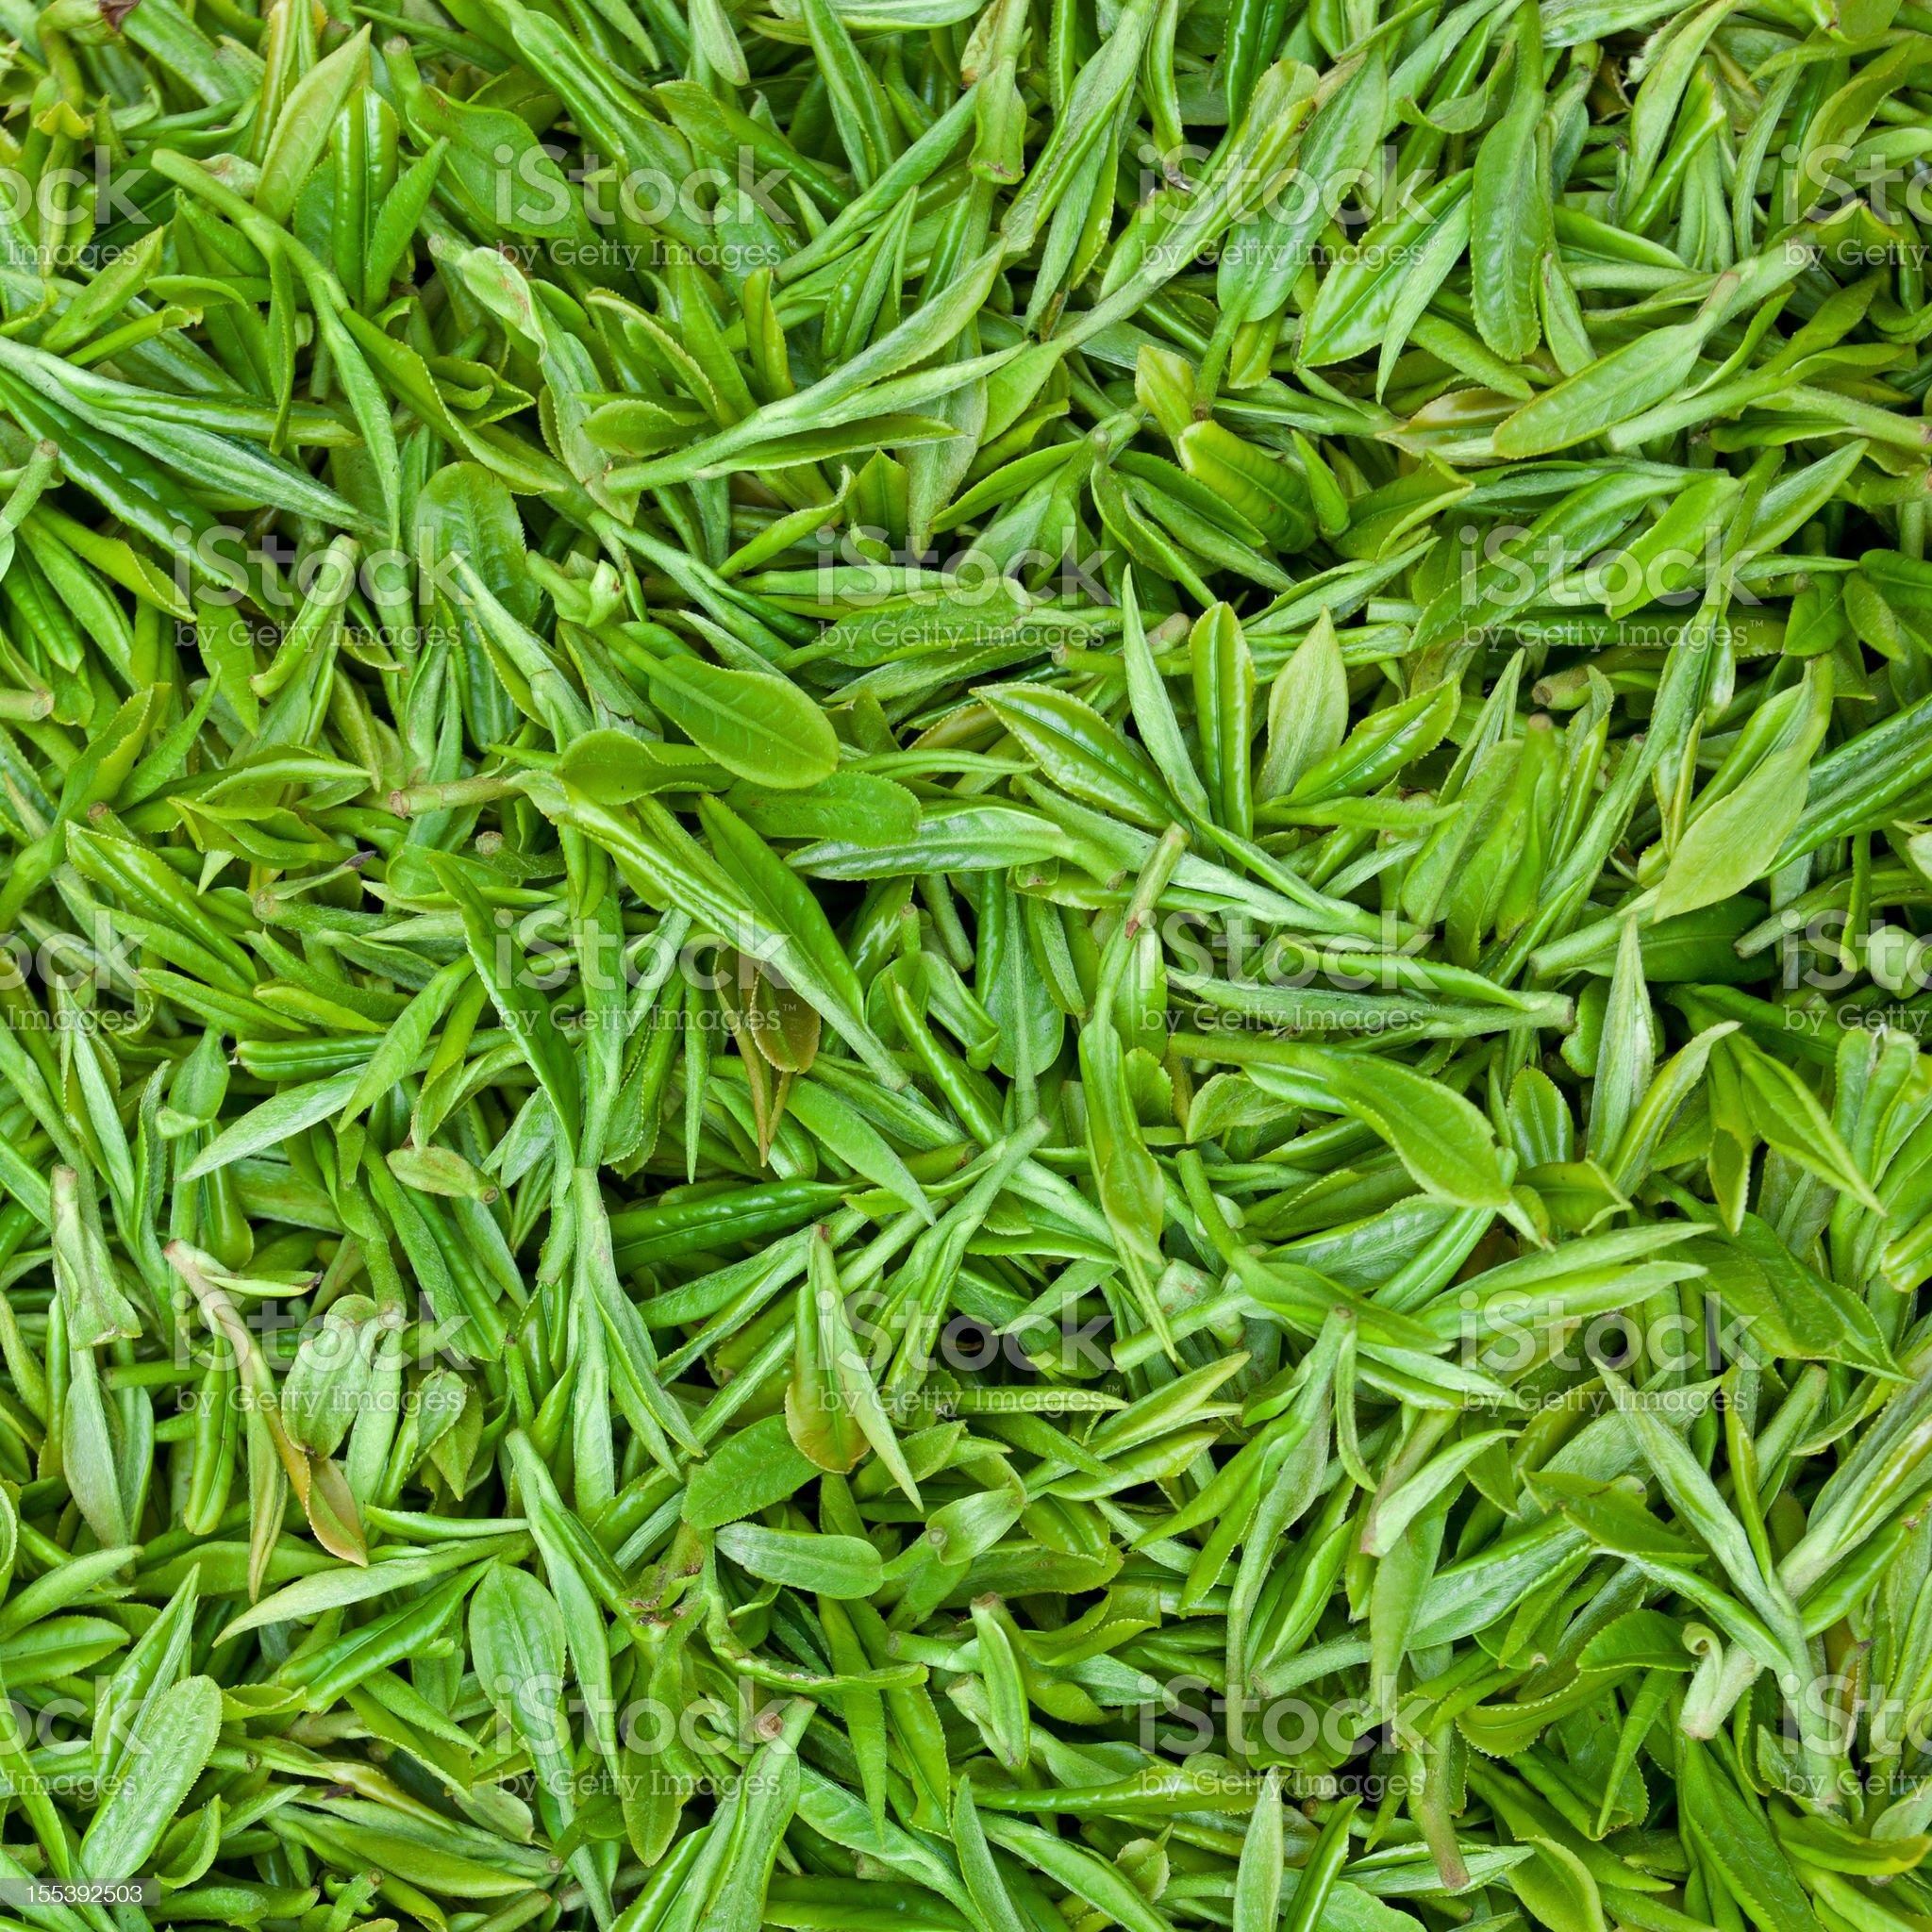 Fresh green tea leaves background royalty-free stock photo